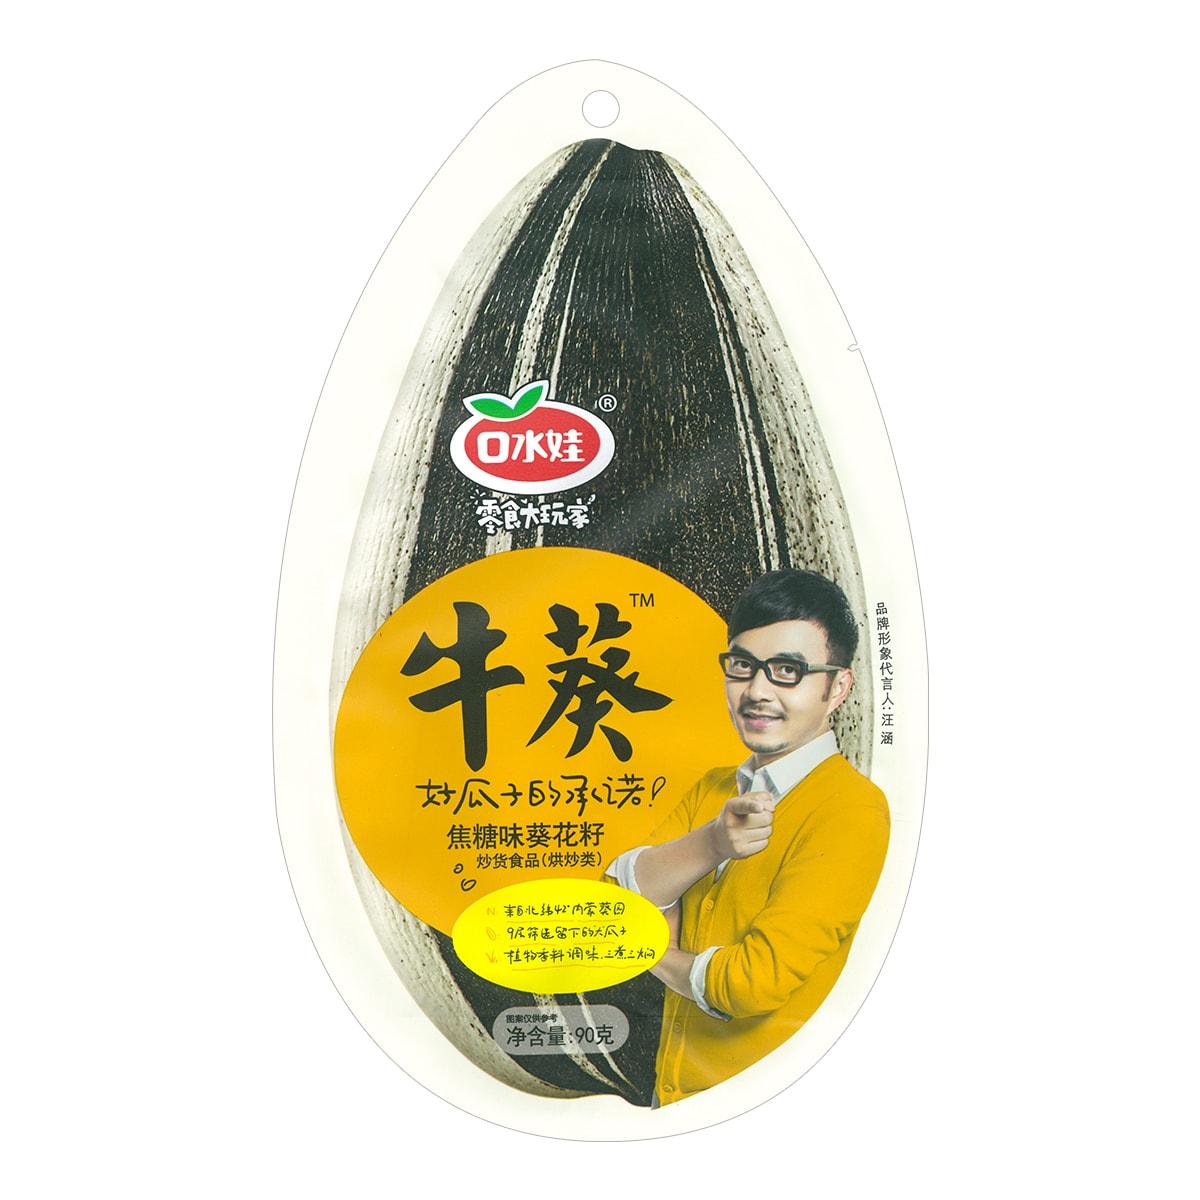 KOUSHUIWA Sunflower Seeds -  Caramel Flavor 90g